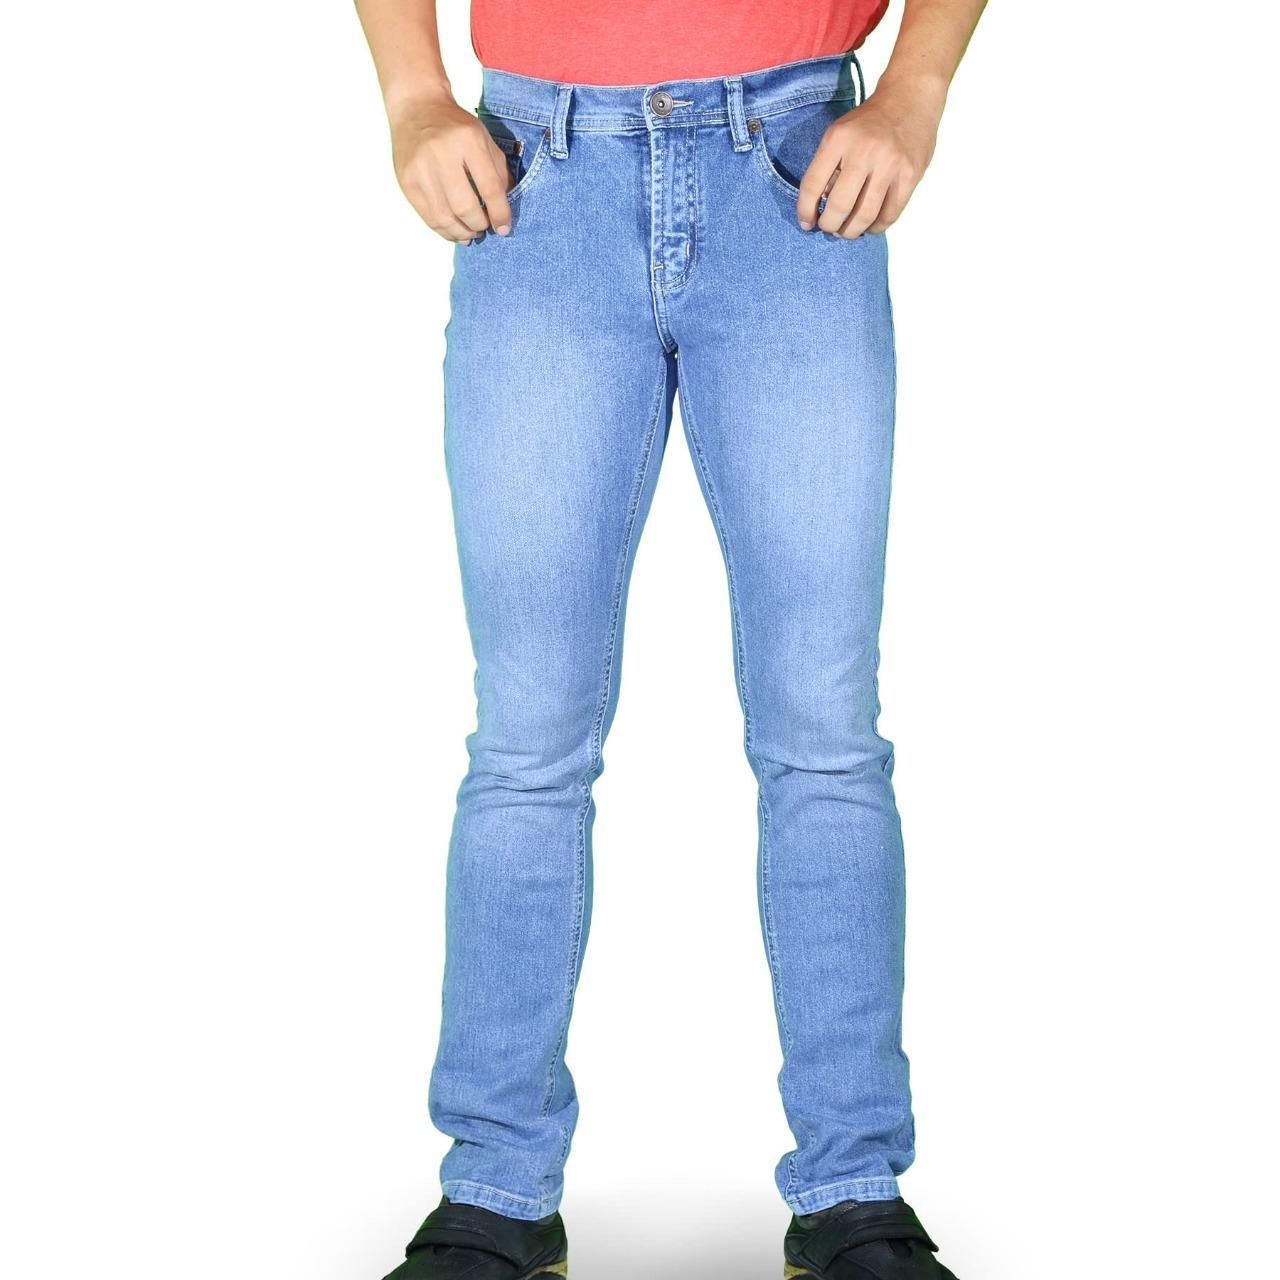 Emba Jeans Celana Panjang Pria BS 07.1 Morgan Slim 617-11205-66-Riveira Blue